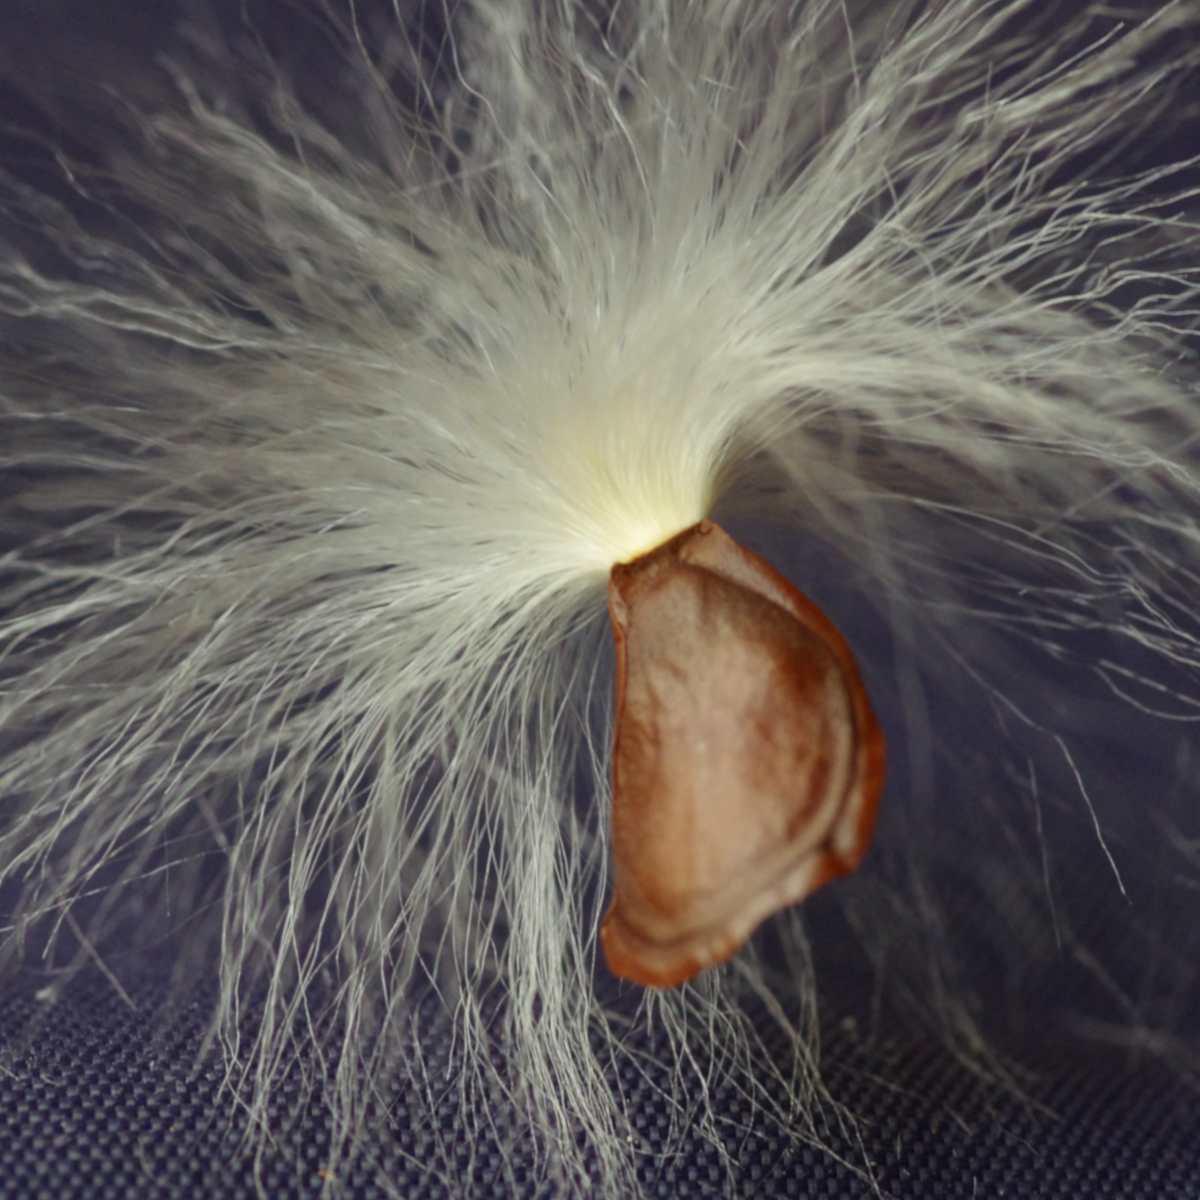 Seeds from the Stephanotis vine